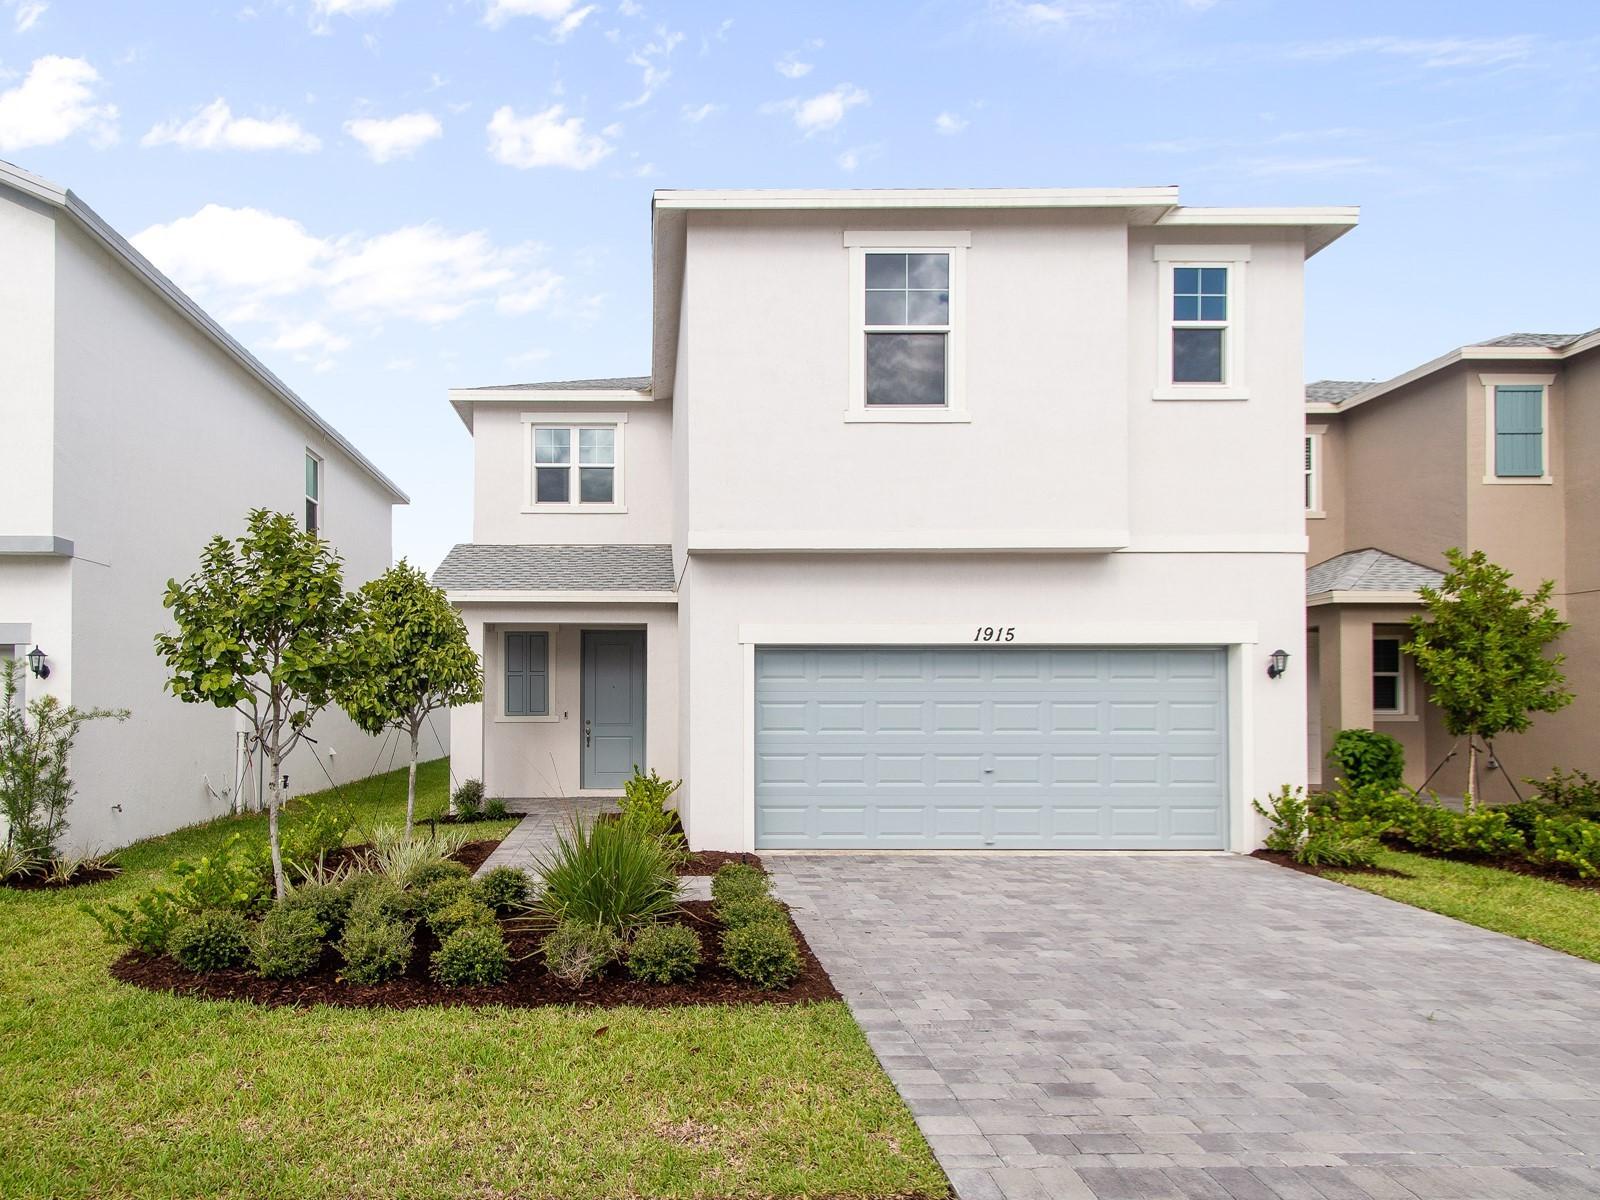 Home for sale in Lake Cove Lake Worth Florida